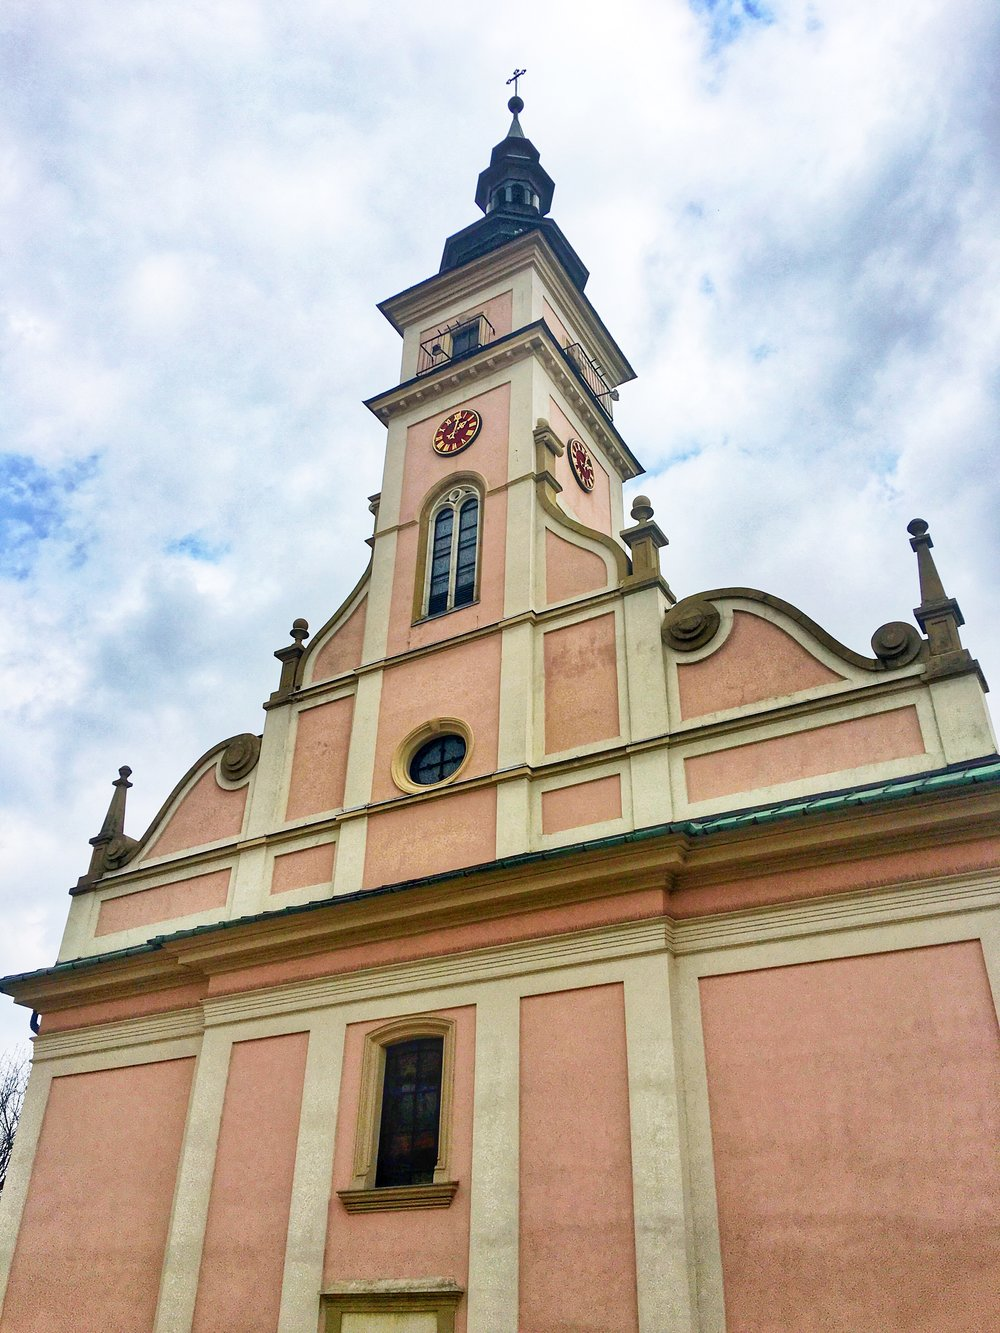 St. Klemens Wieliczka